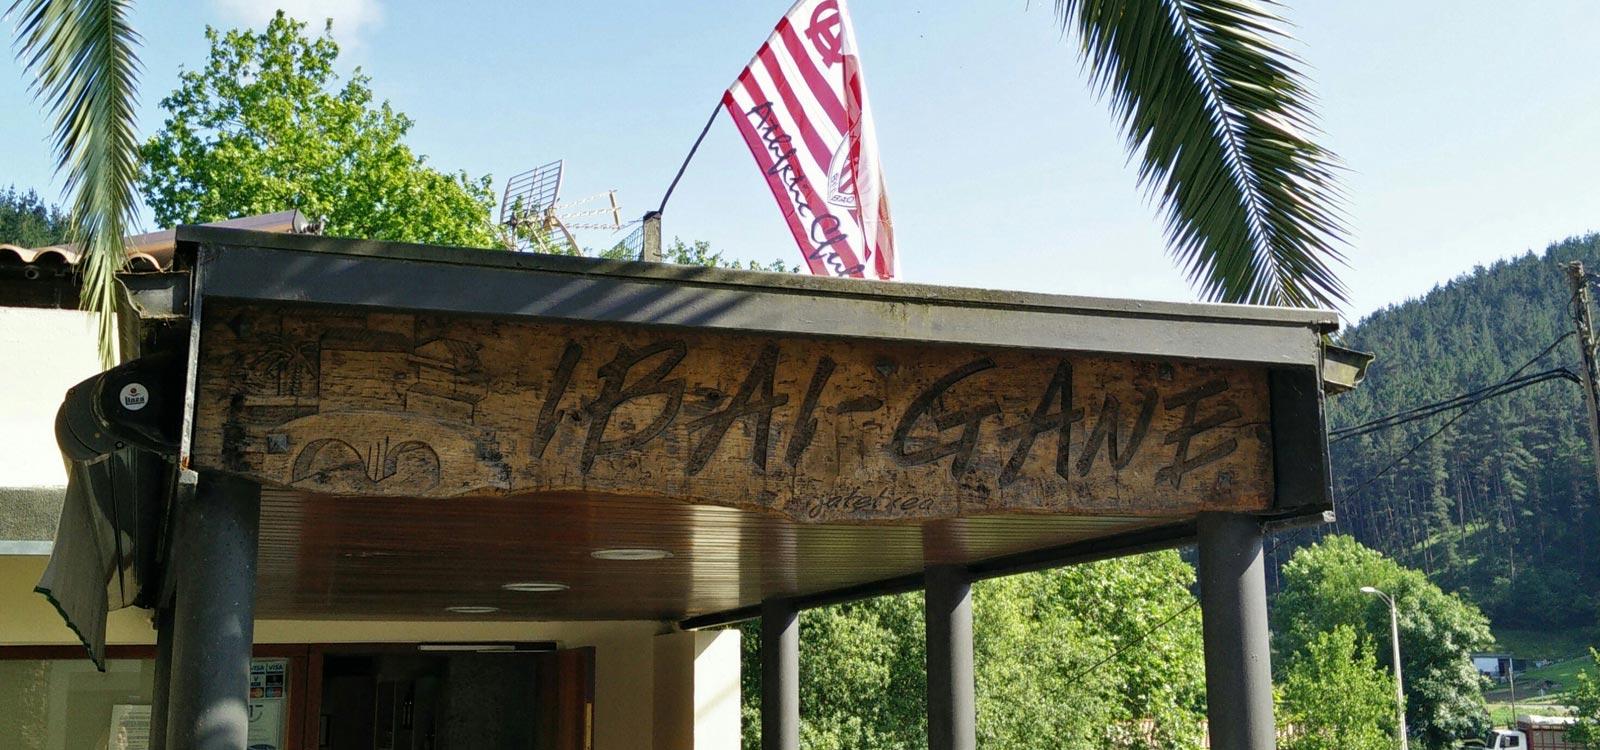 Ibaigane Restaurant Jatetxea bar entrance